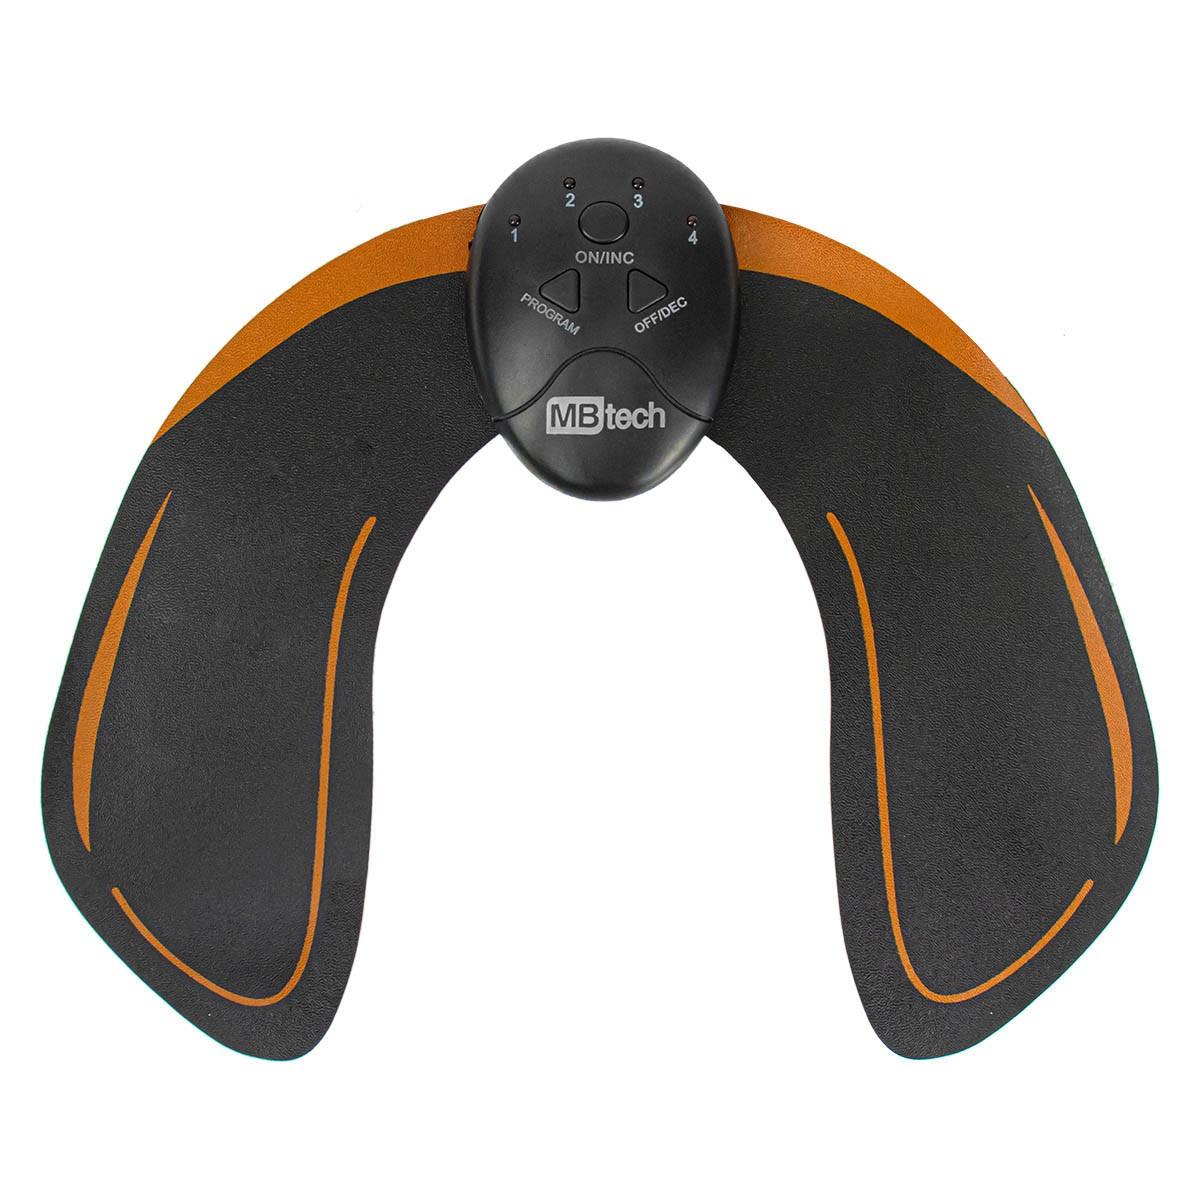 Smart Trainer Estimulador Muscular Elétrico para Glúteos MBfit MB87129